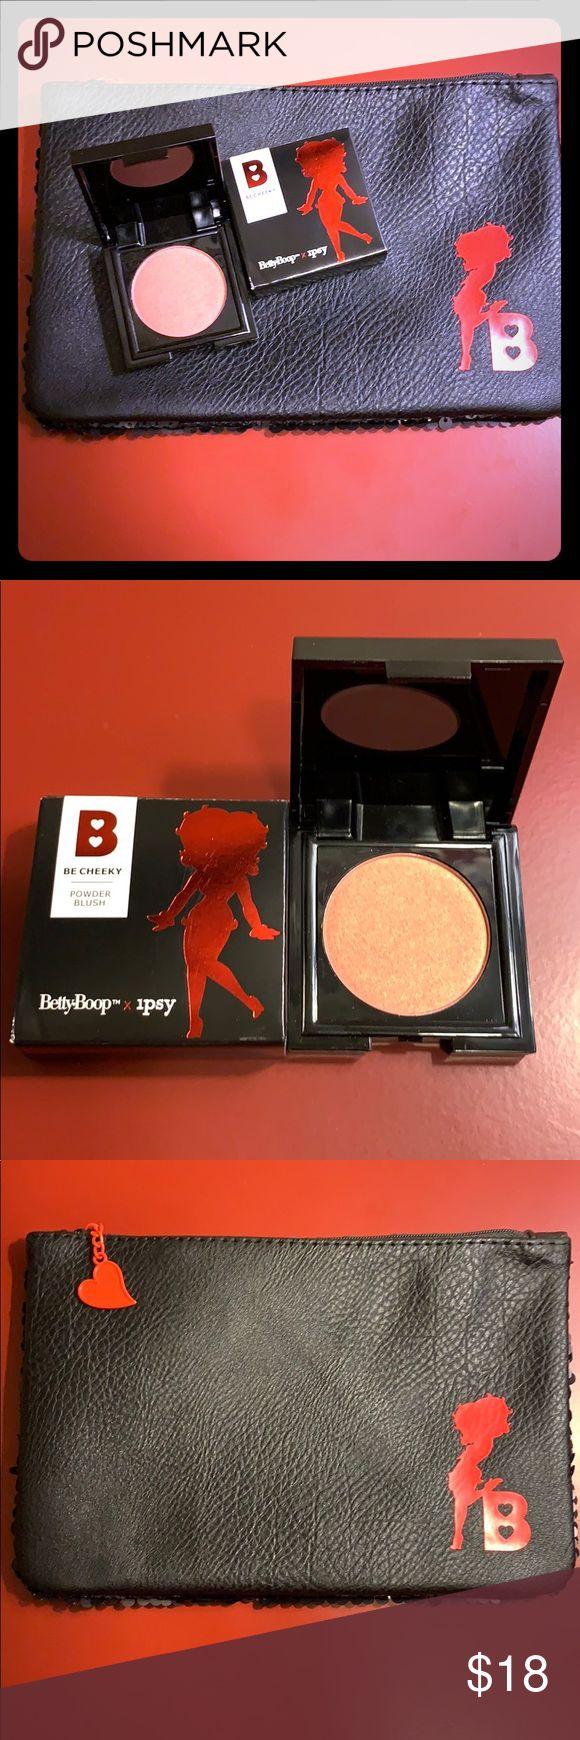 Betty Boop x IPSY Blush, Brush & Makeup Bag 💋 Makeup bag